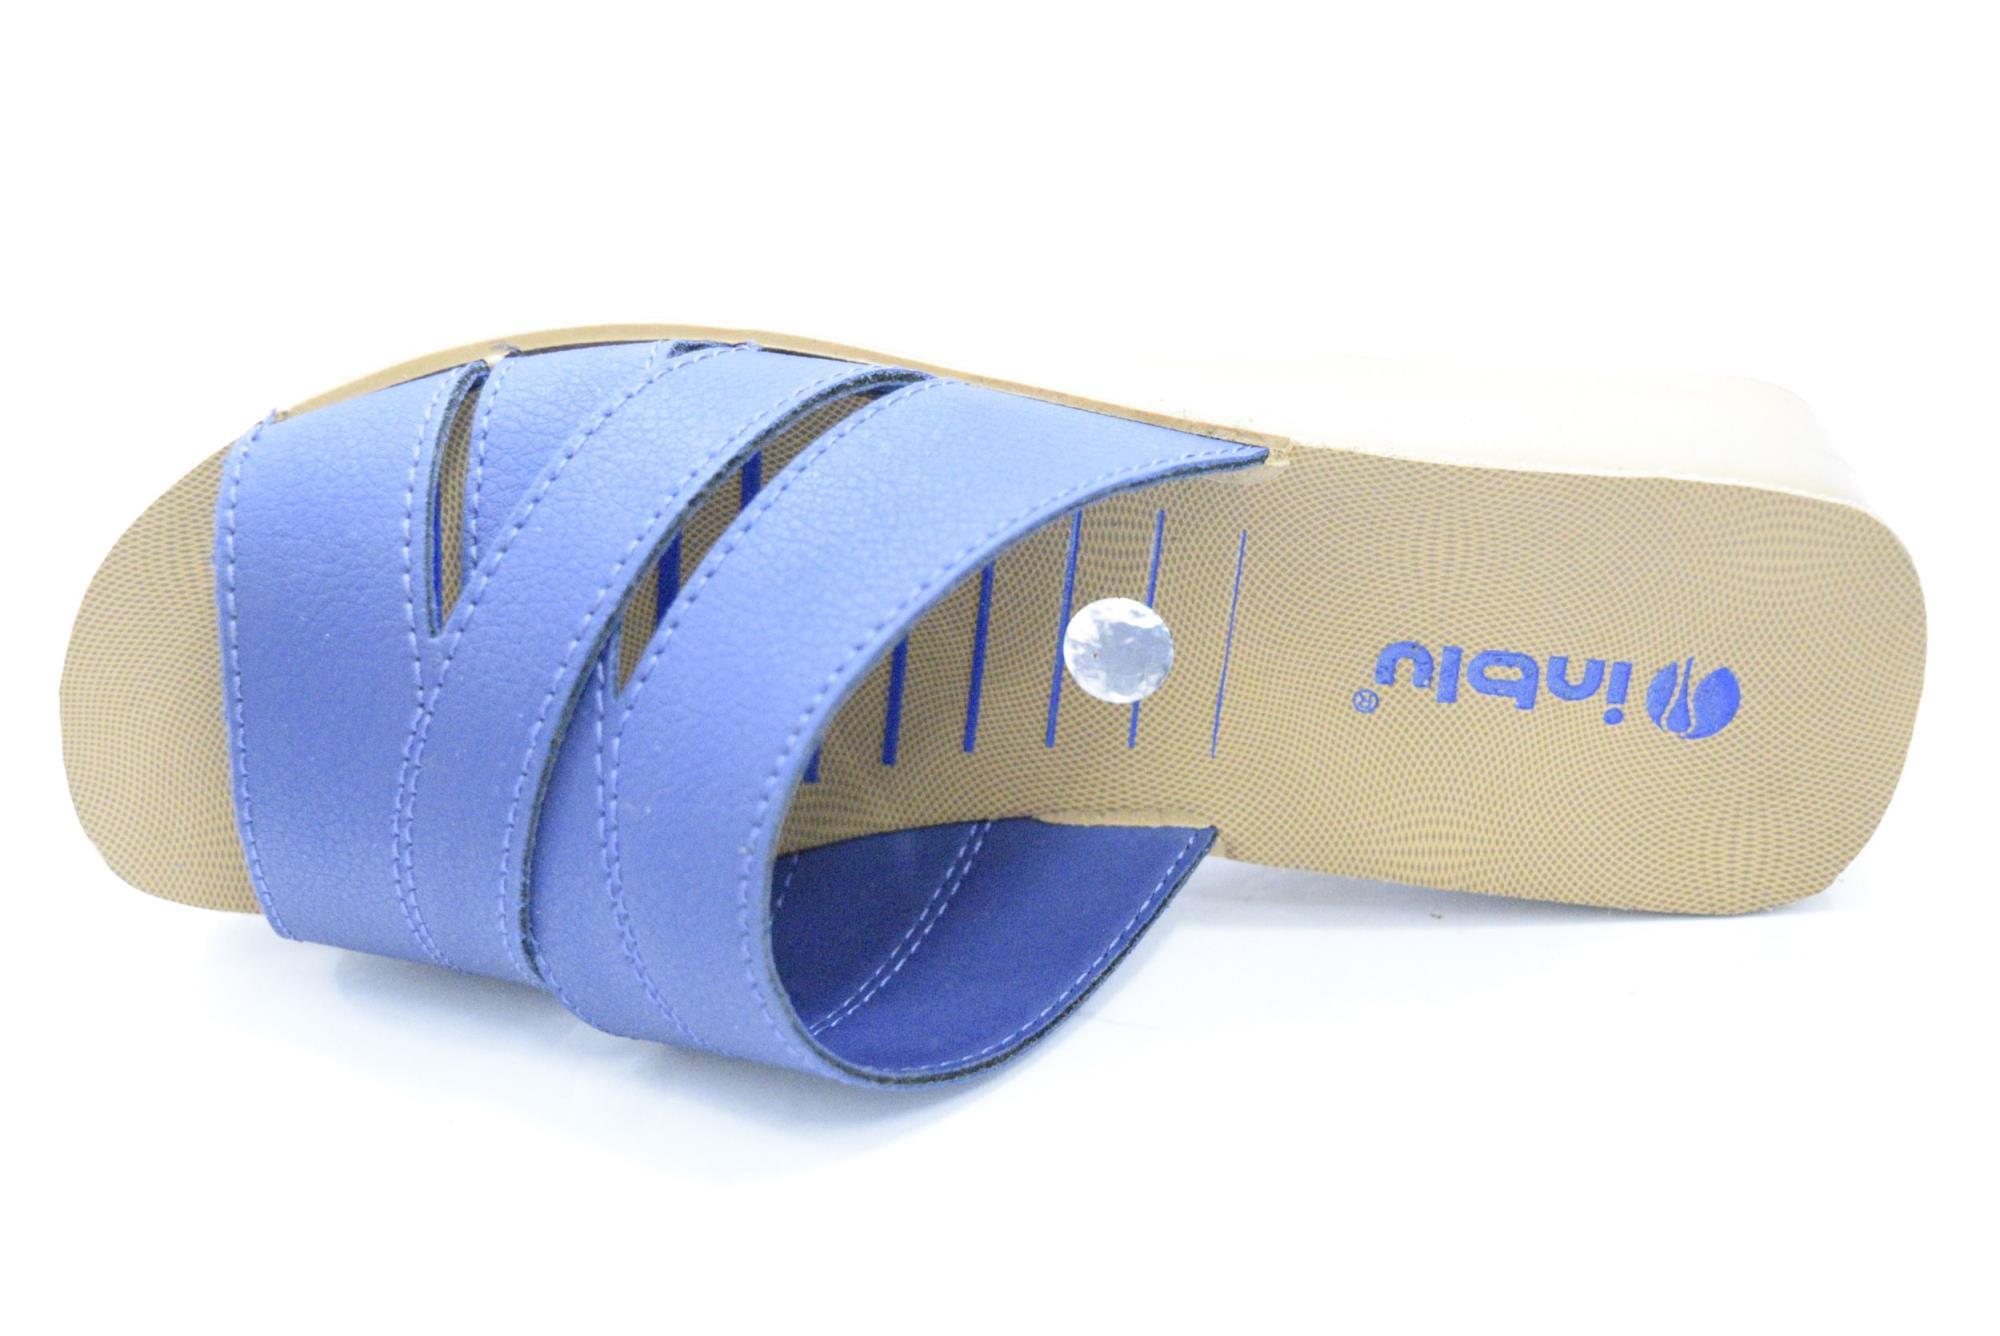 641305ff4 Inblu BLUE W.CHAPPAL    Online Shopping   PARMAR BOOT HOUSE